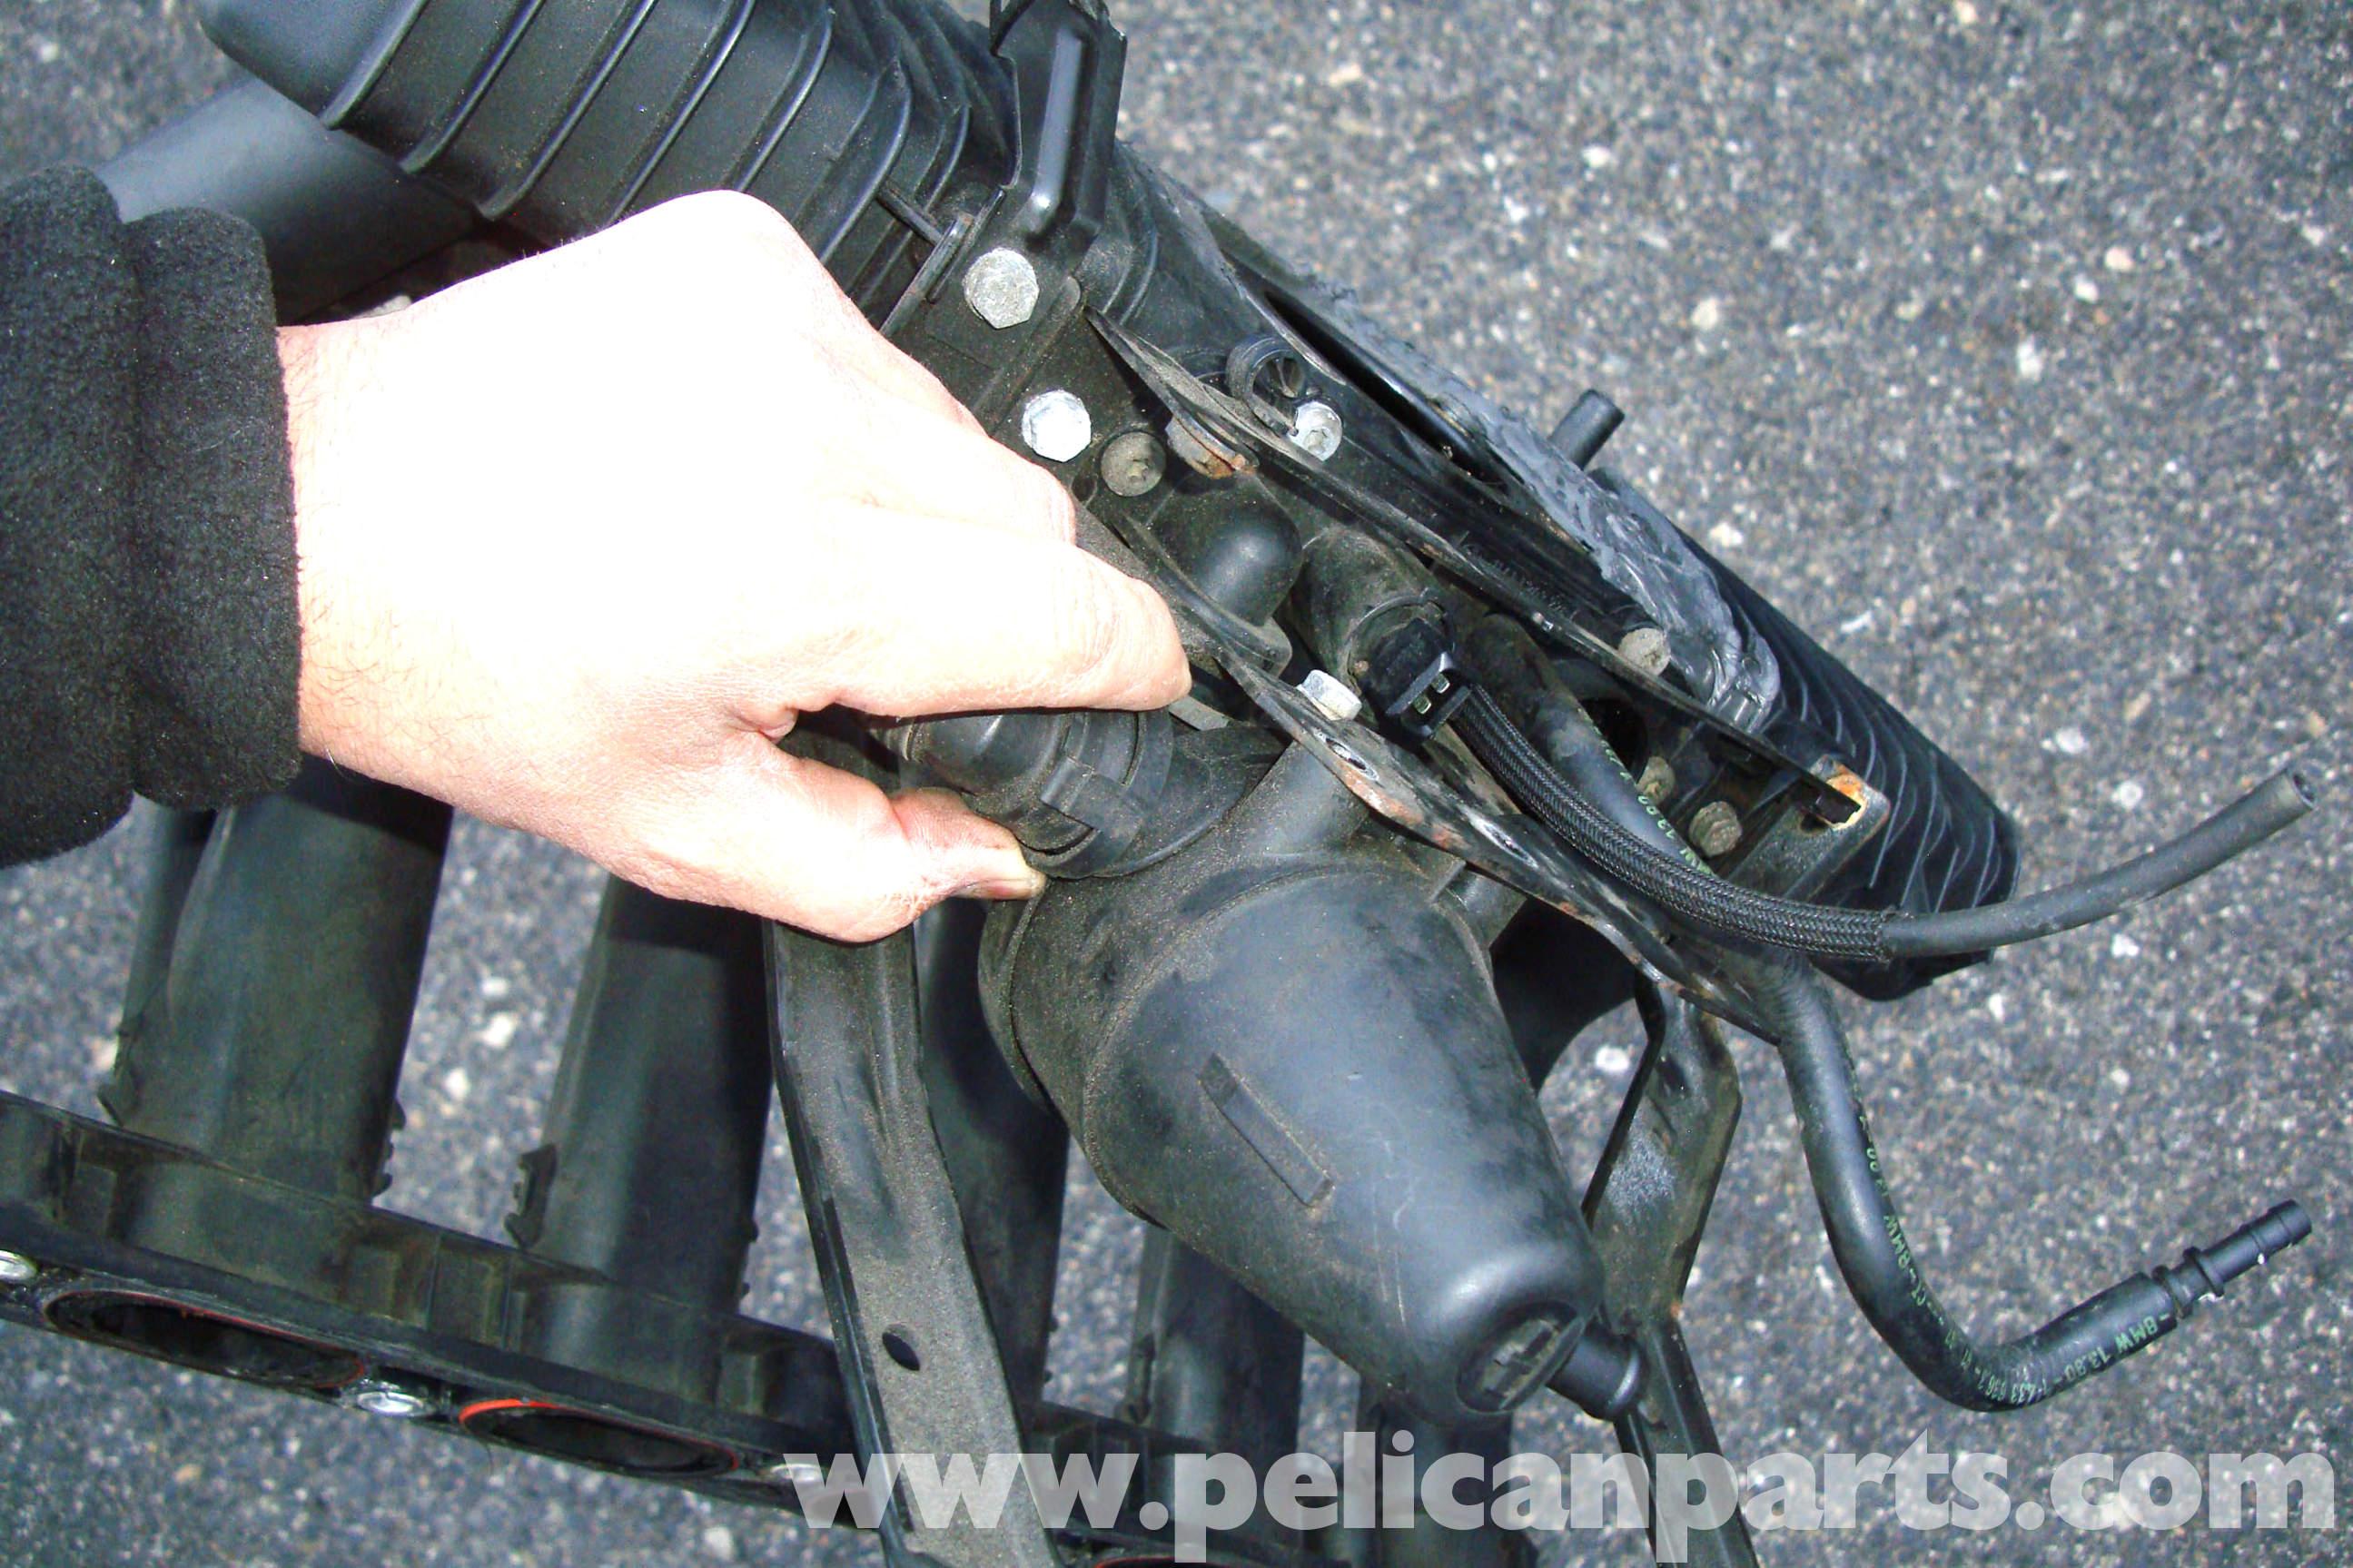 Bmw E39 5 Series Pcv System Removal 1997 2003 525i 528i 530i 540i Pelican Parts Diy Maintenance Article